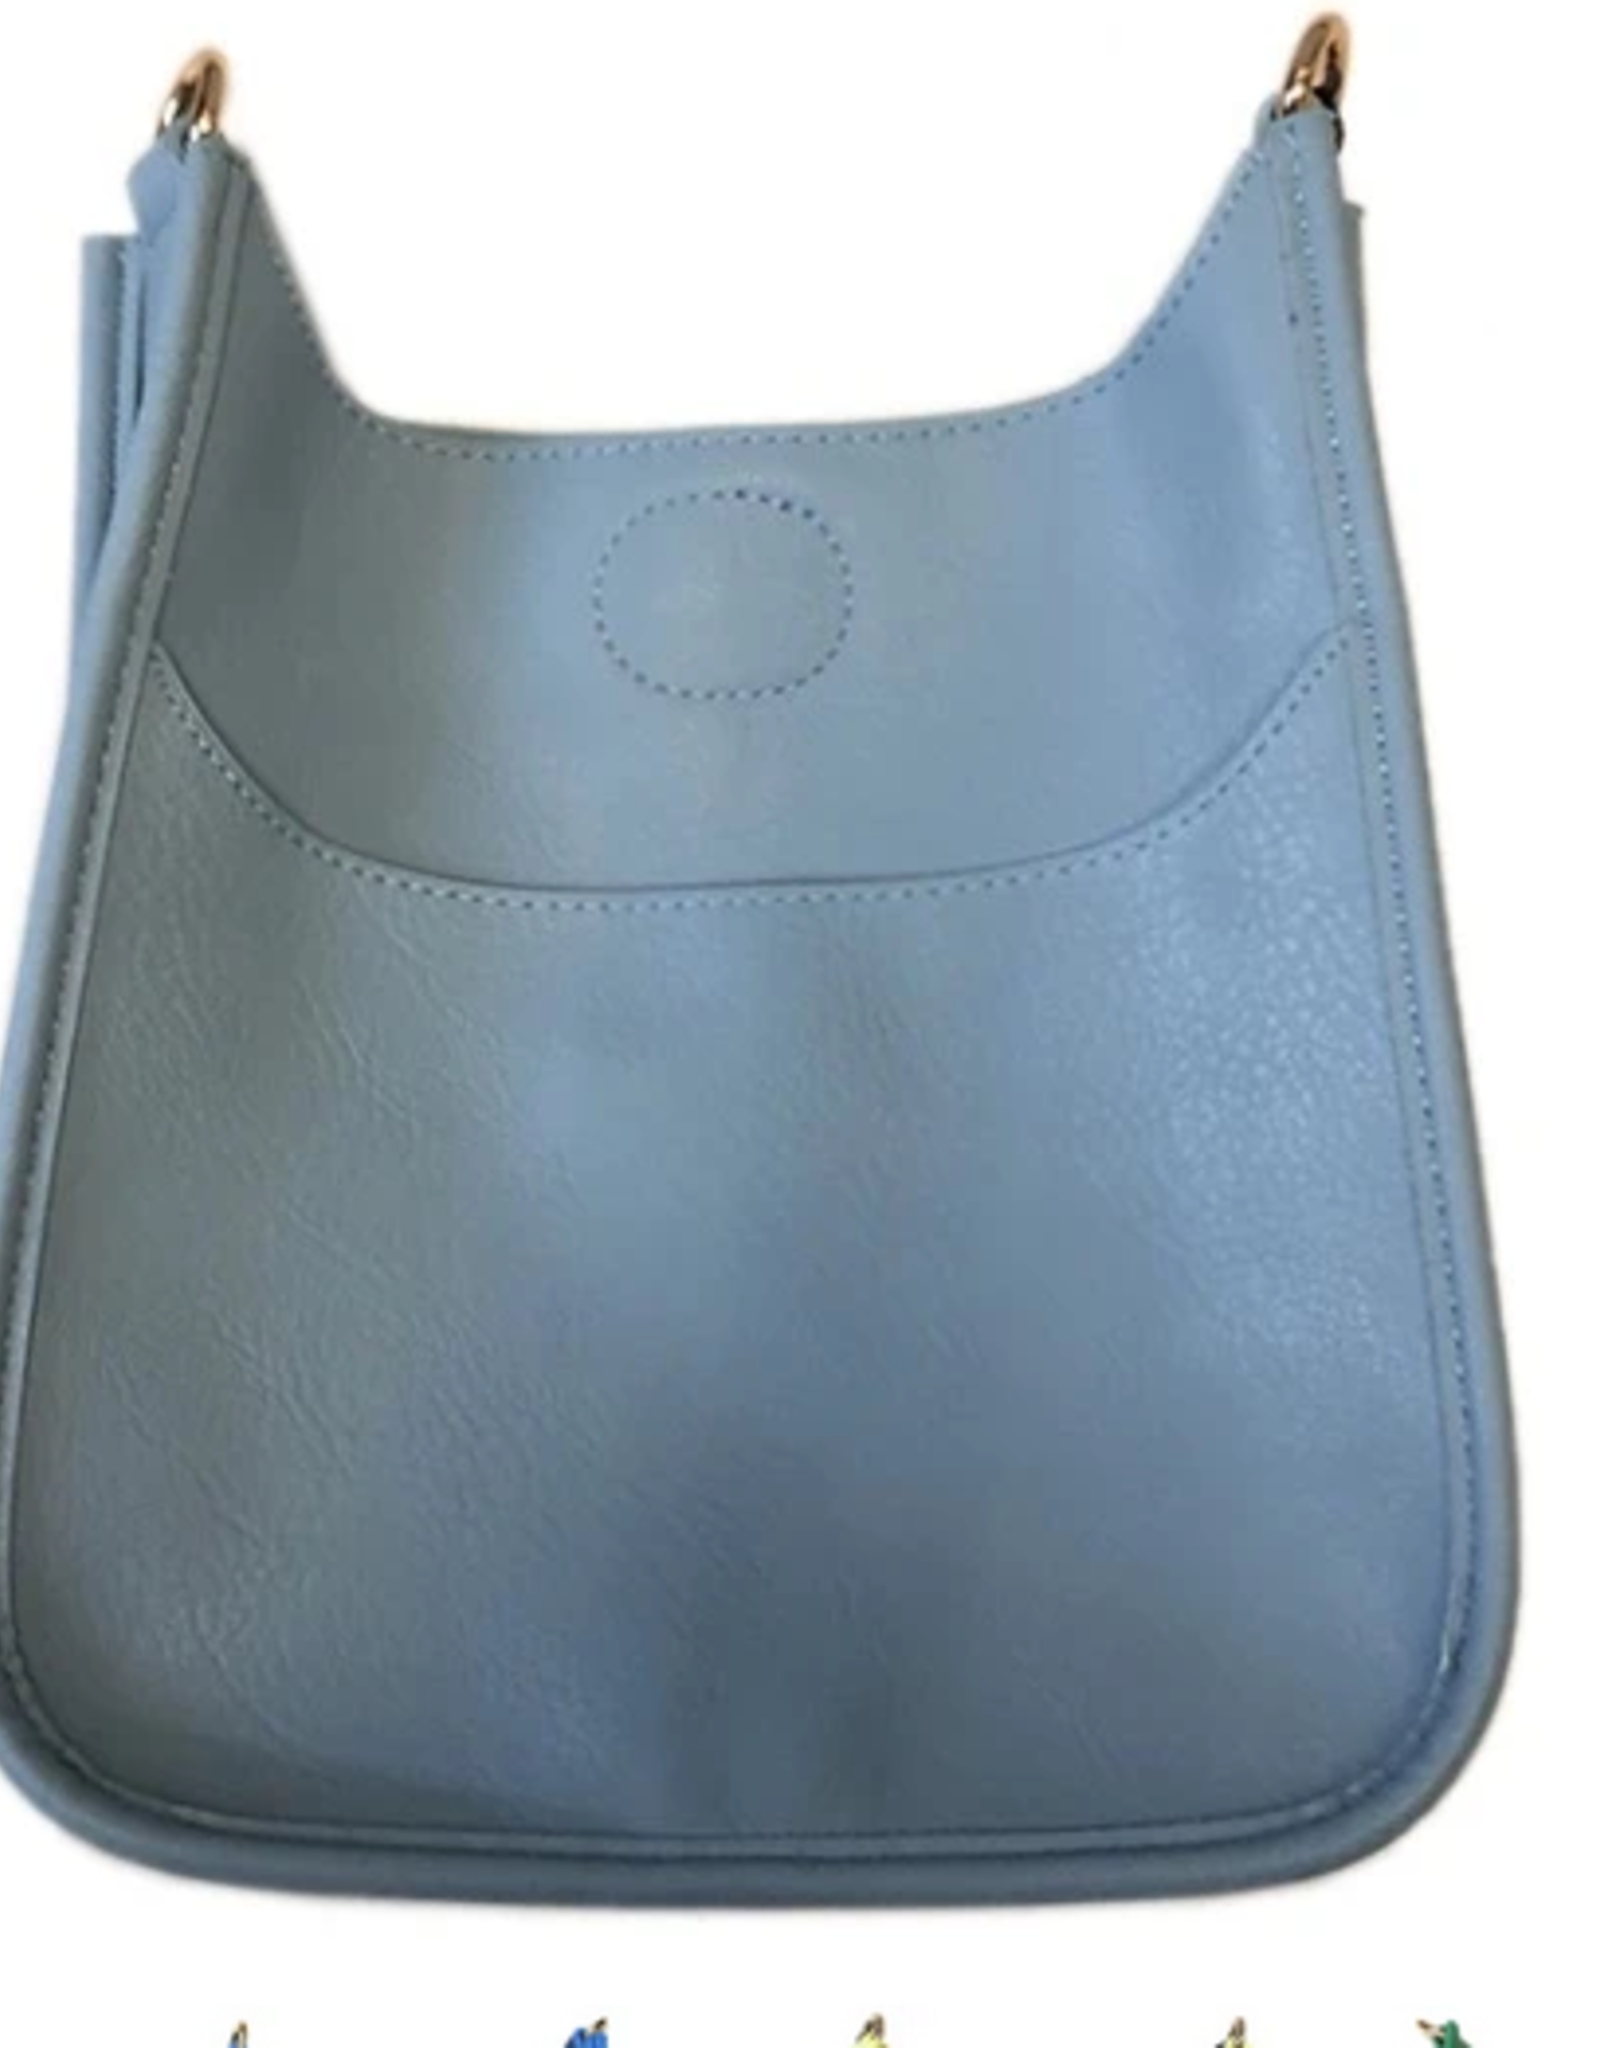 Mini Vegan Messenger Bag w/Gold Hardware